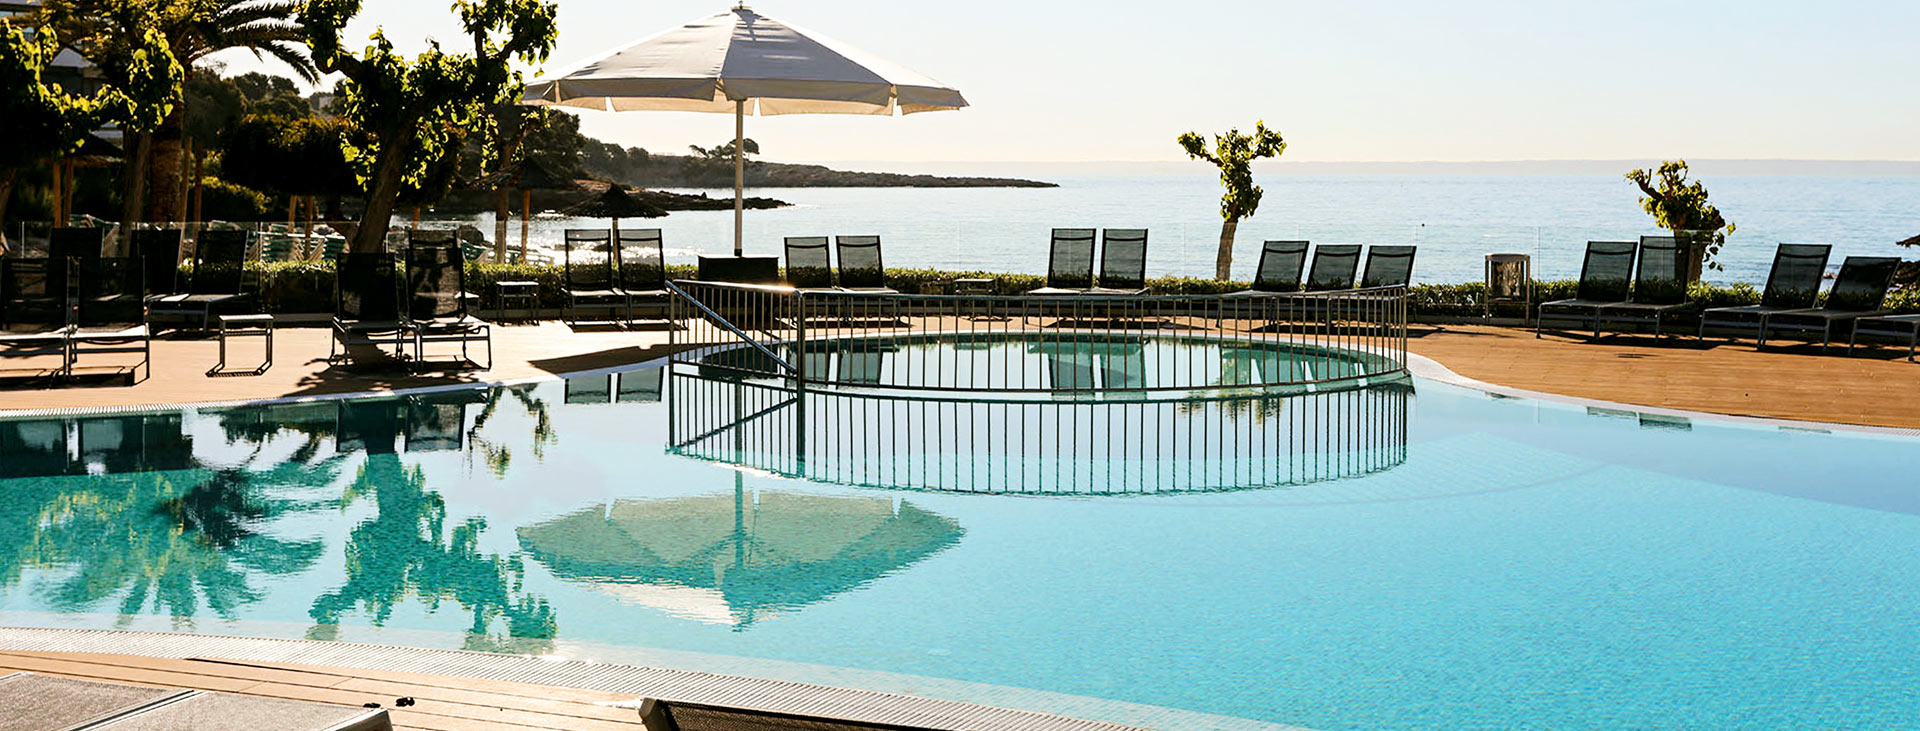 Son Caliu Spa - Oasis, Palma Nova/Magaluf, Mallorca, Spanien